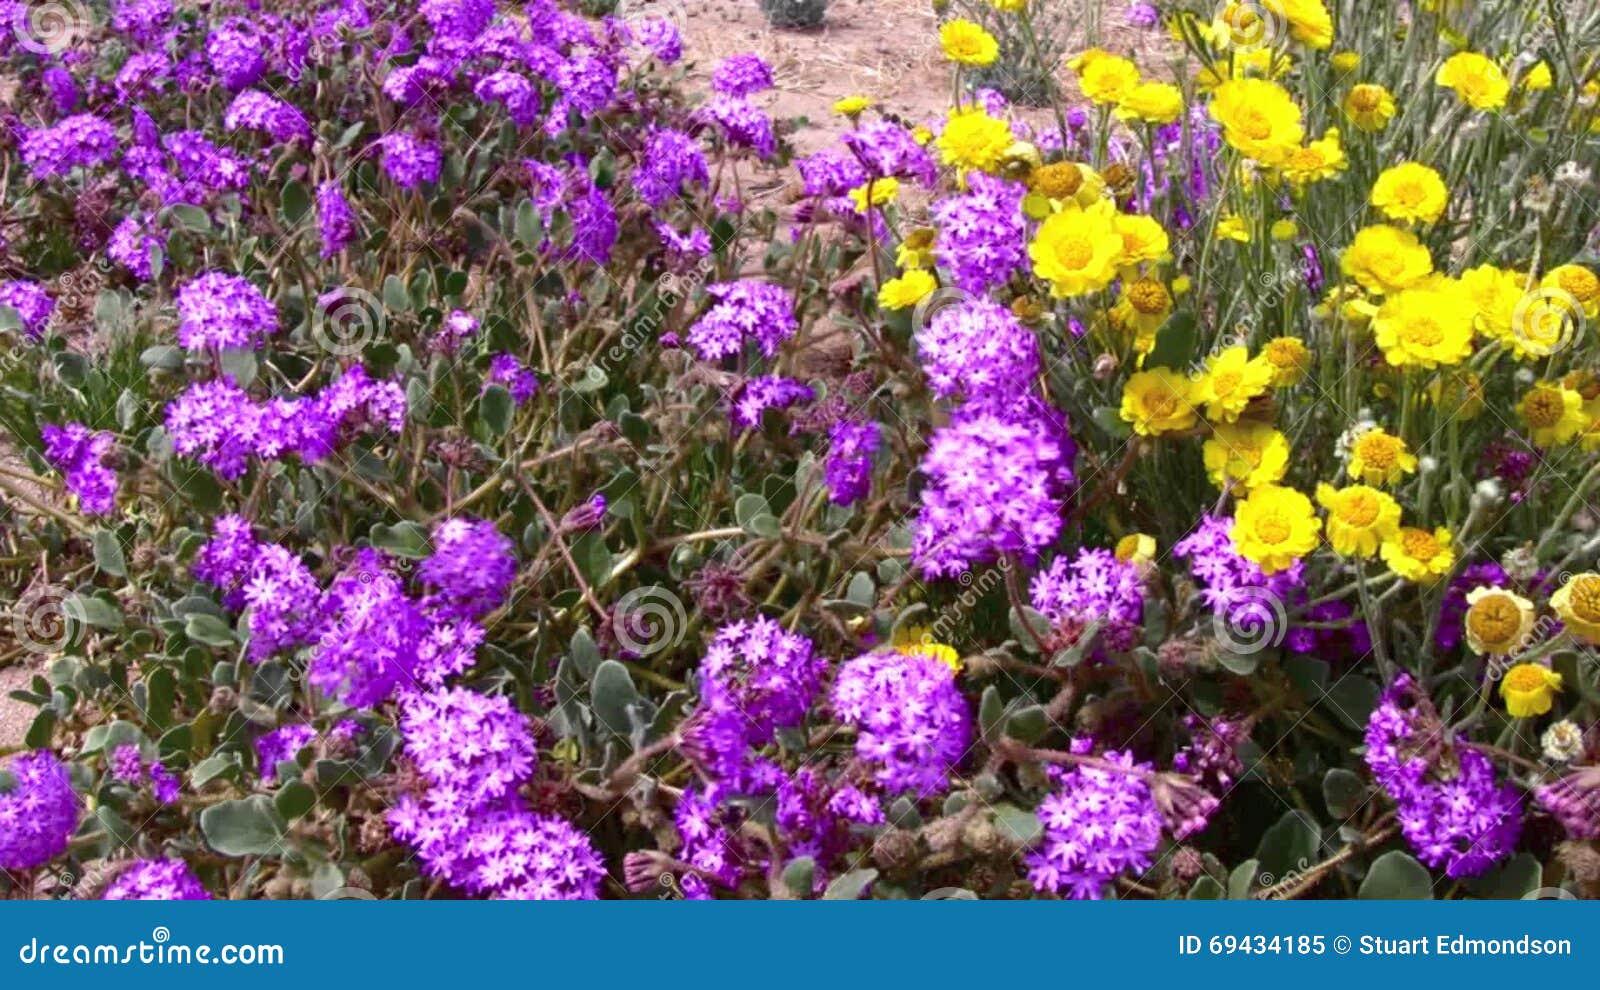 desert flowers wind 4 joshua tree national park california stock